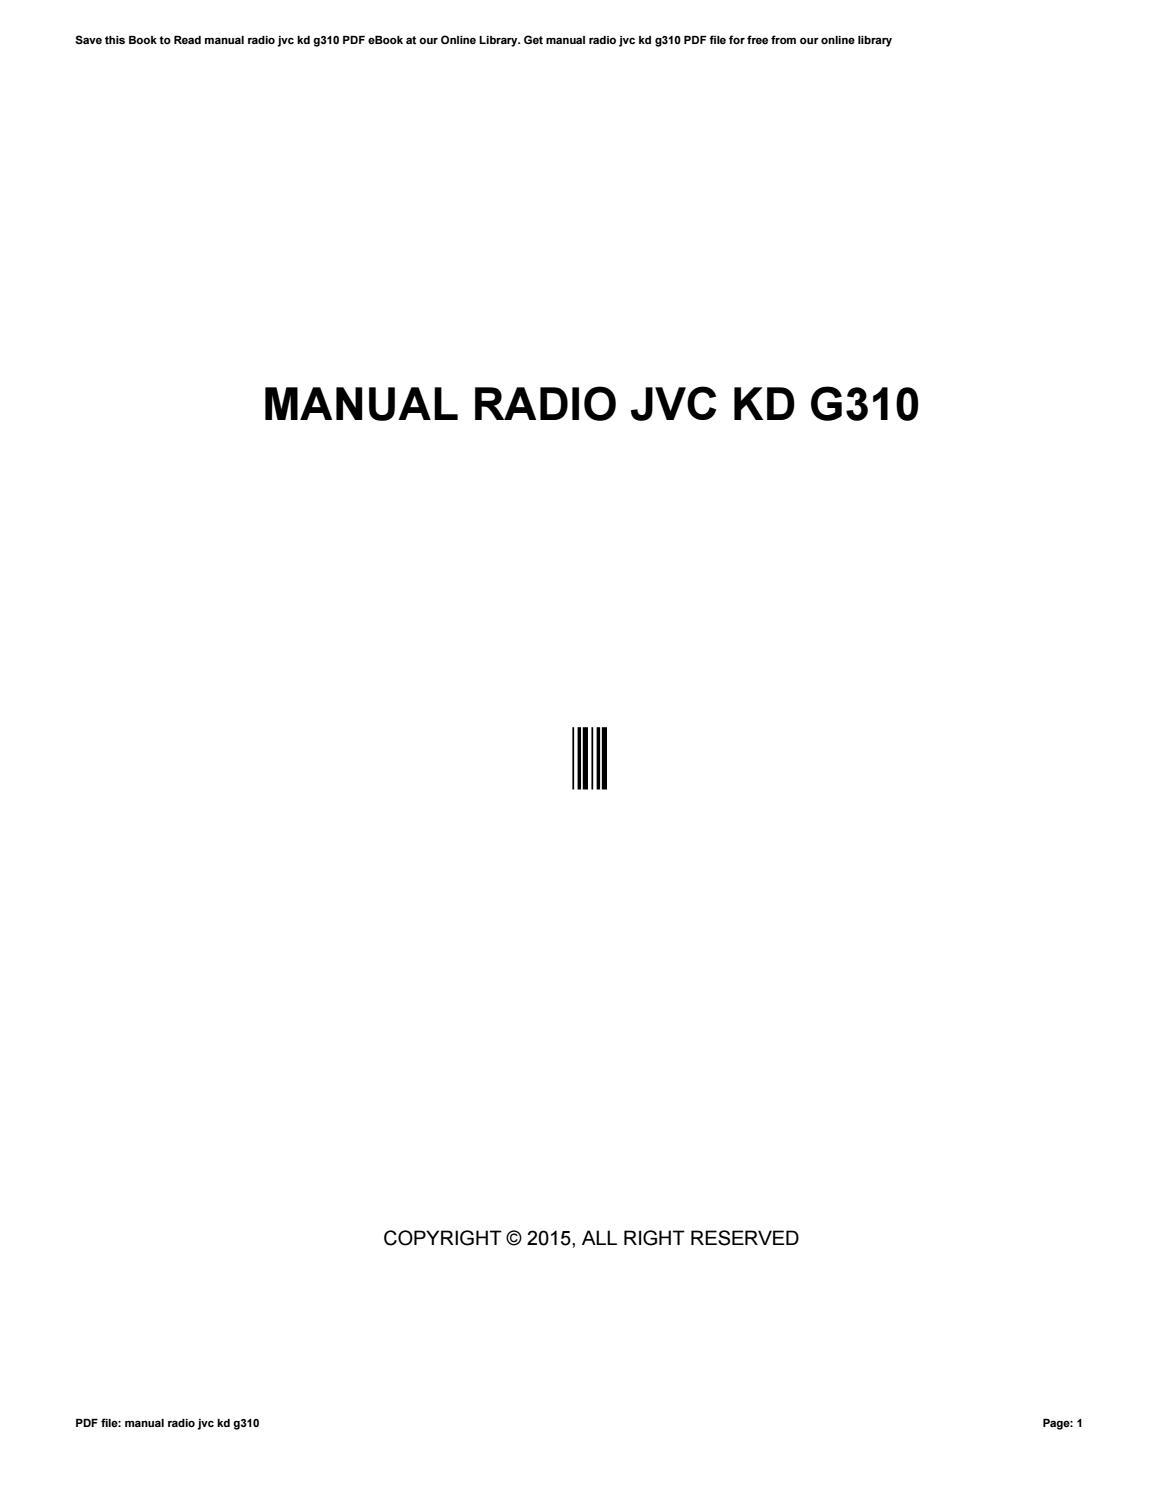 manual radio jvc kd g310 by cetpass3 issuu rh issuu com JVC Car CD Player Installation JVC RM RK50